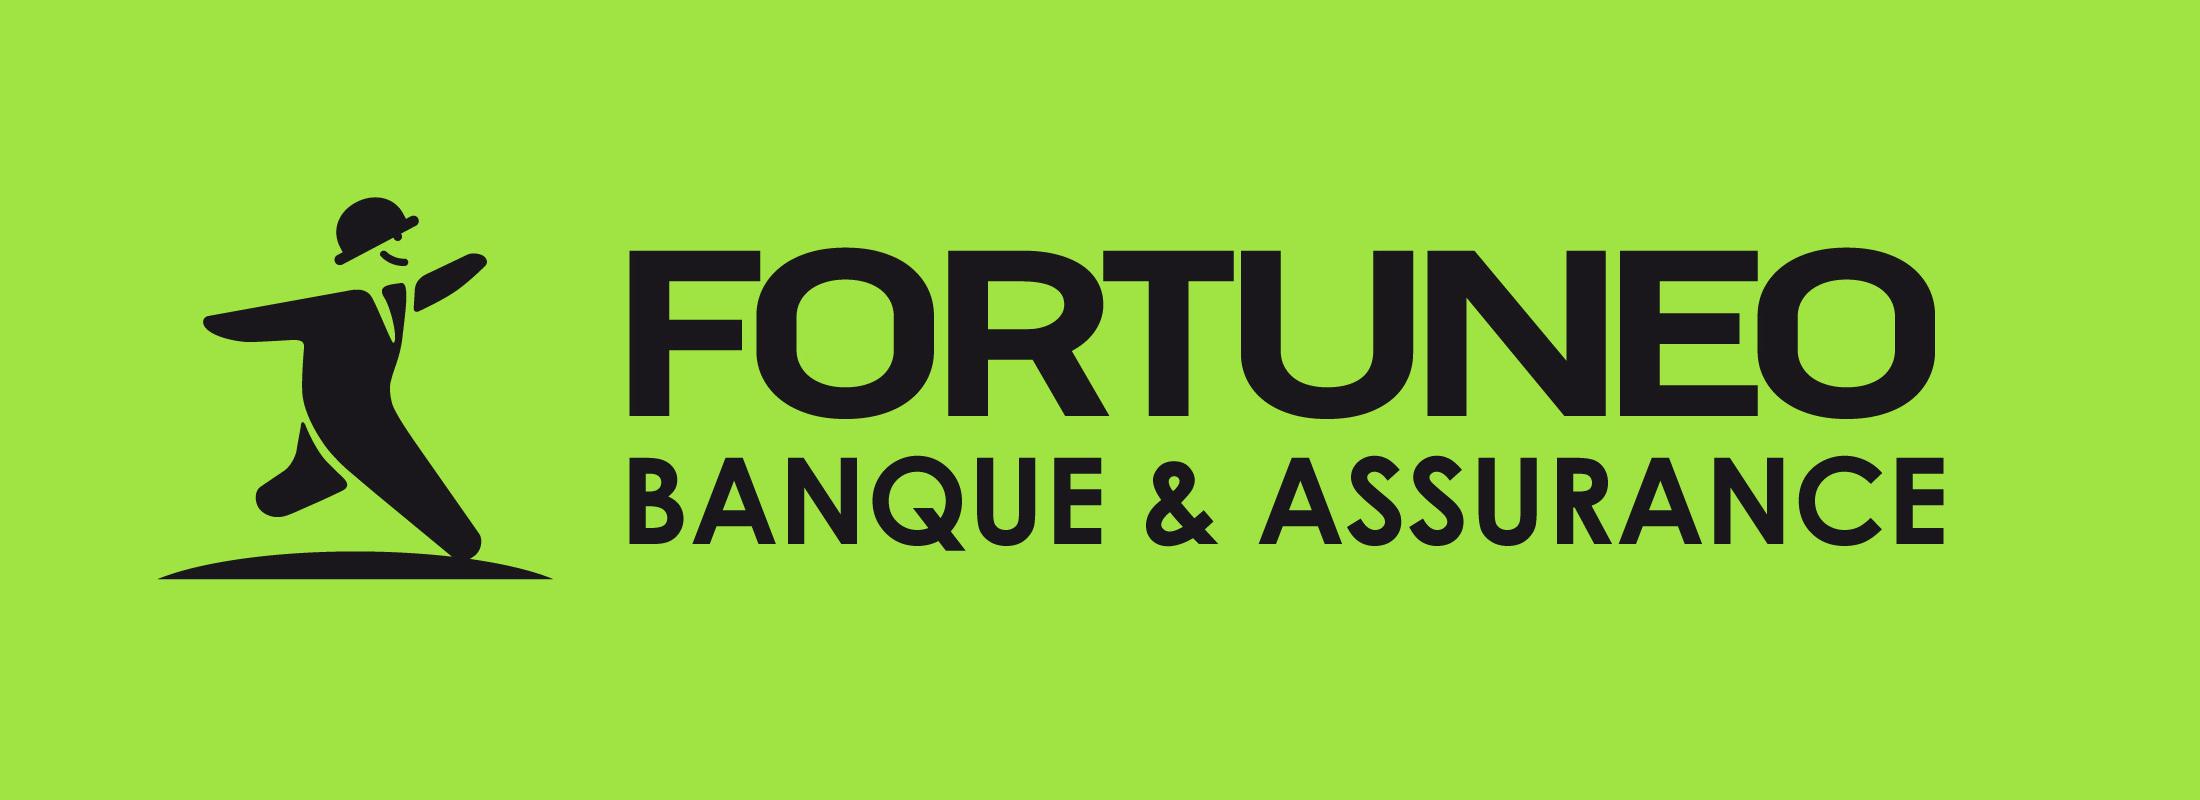 Fortuneo Banque en ligne